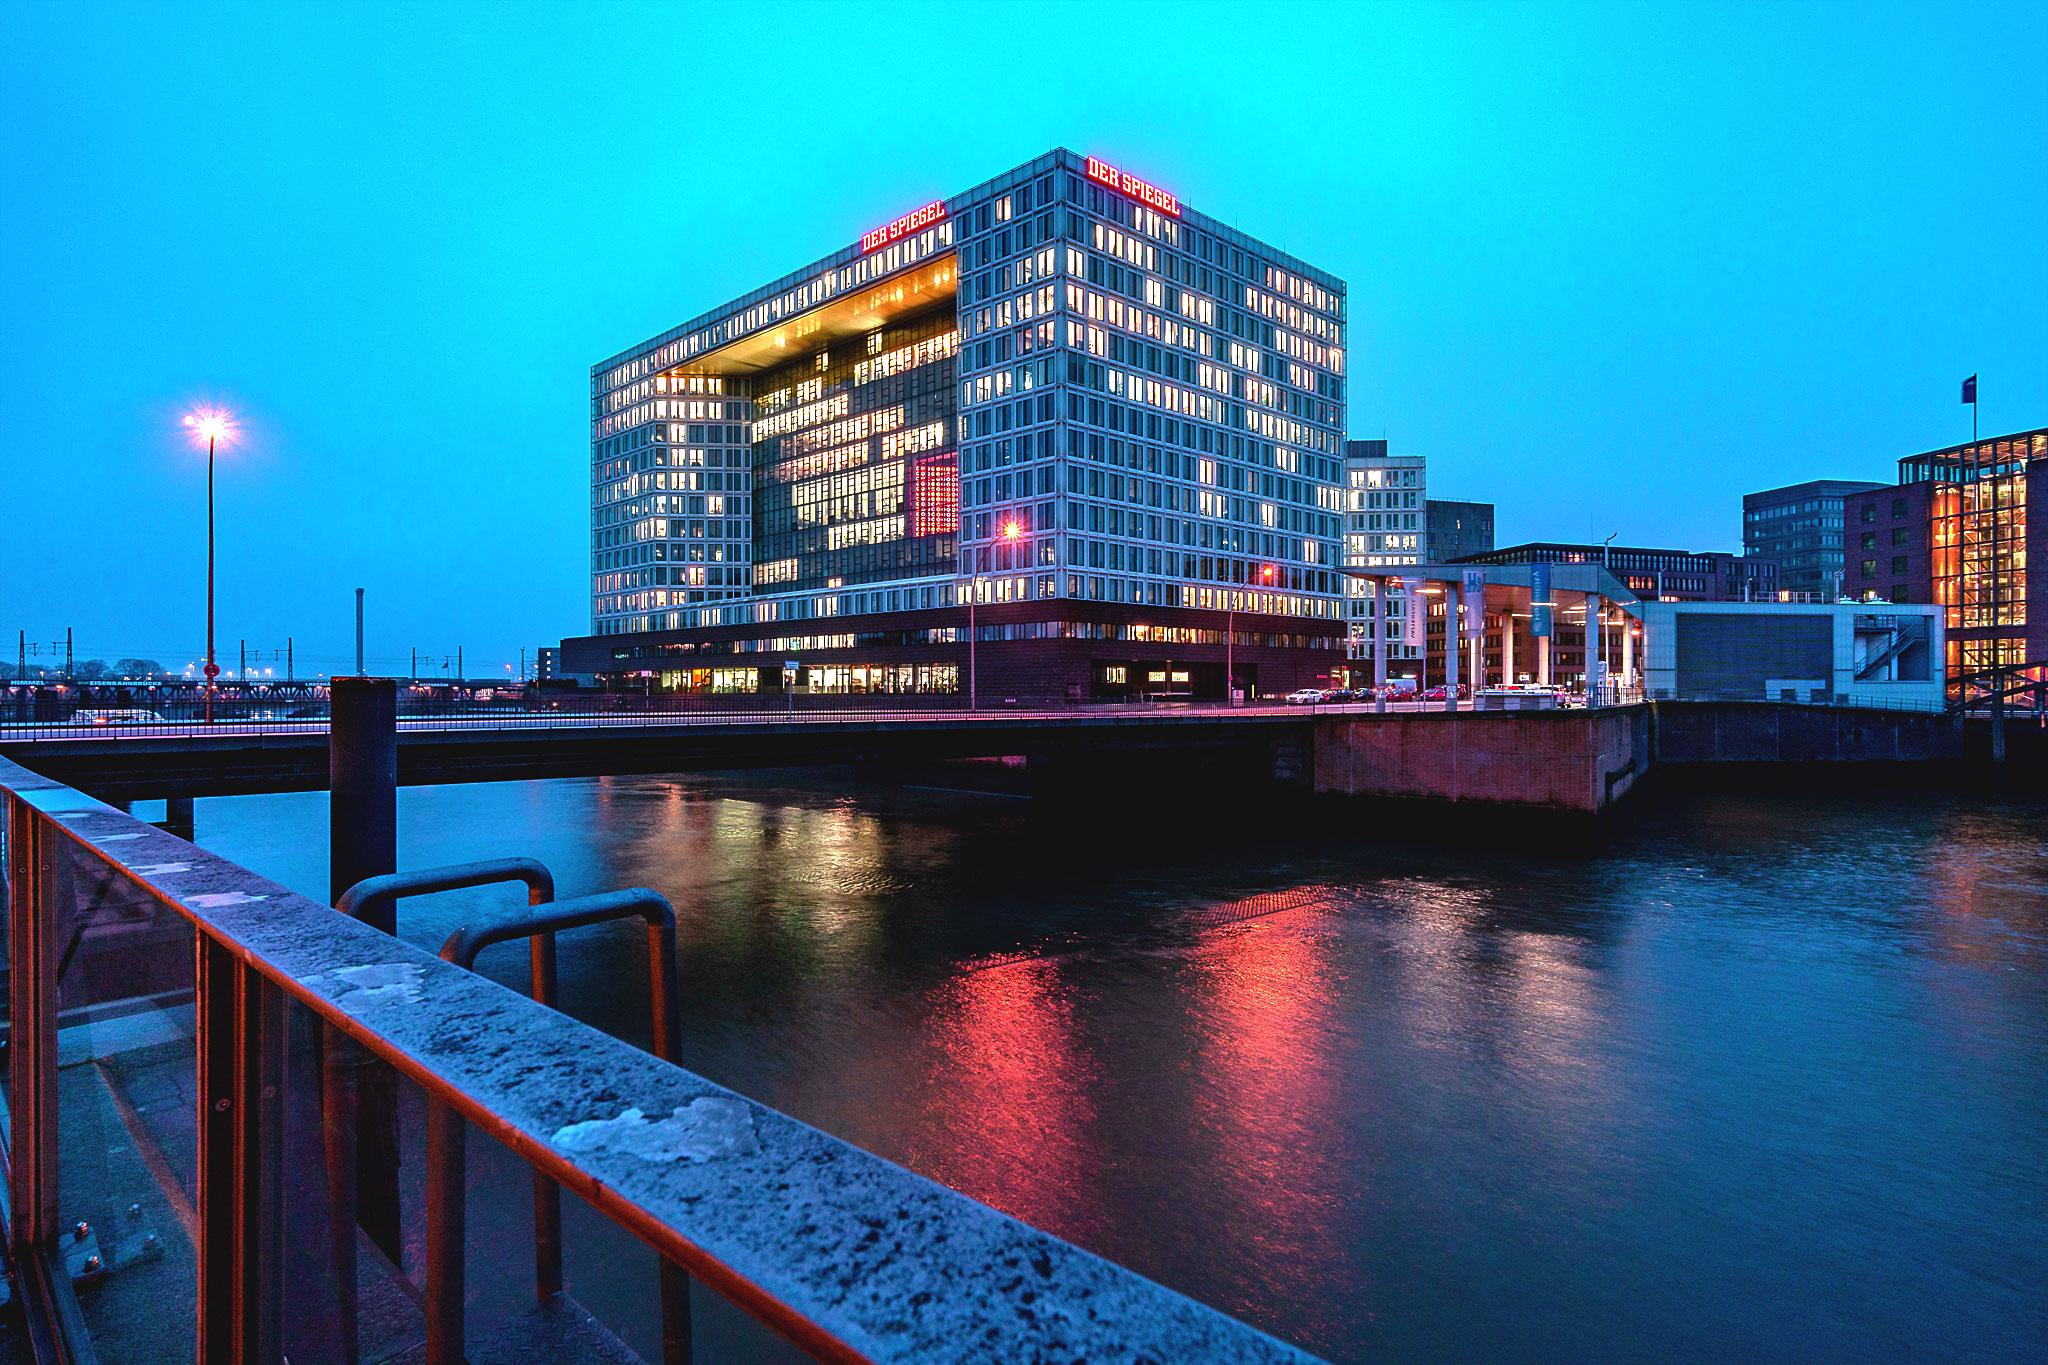 Spiegel Building Hamburg, Germany